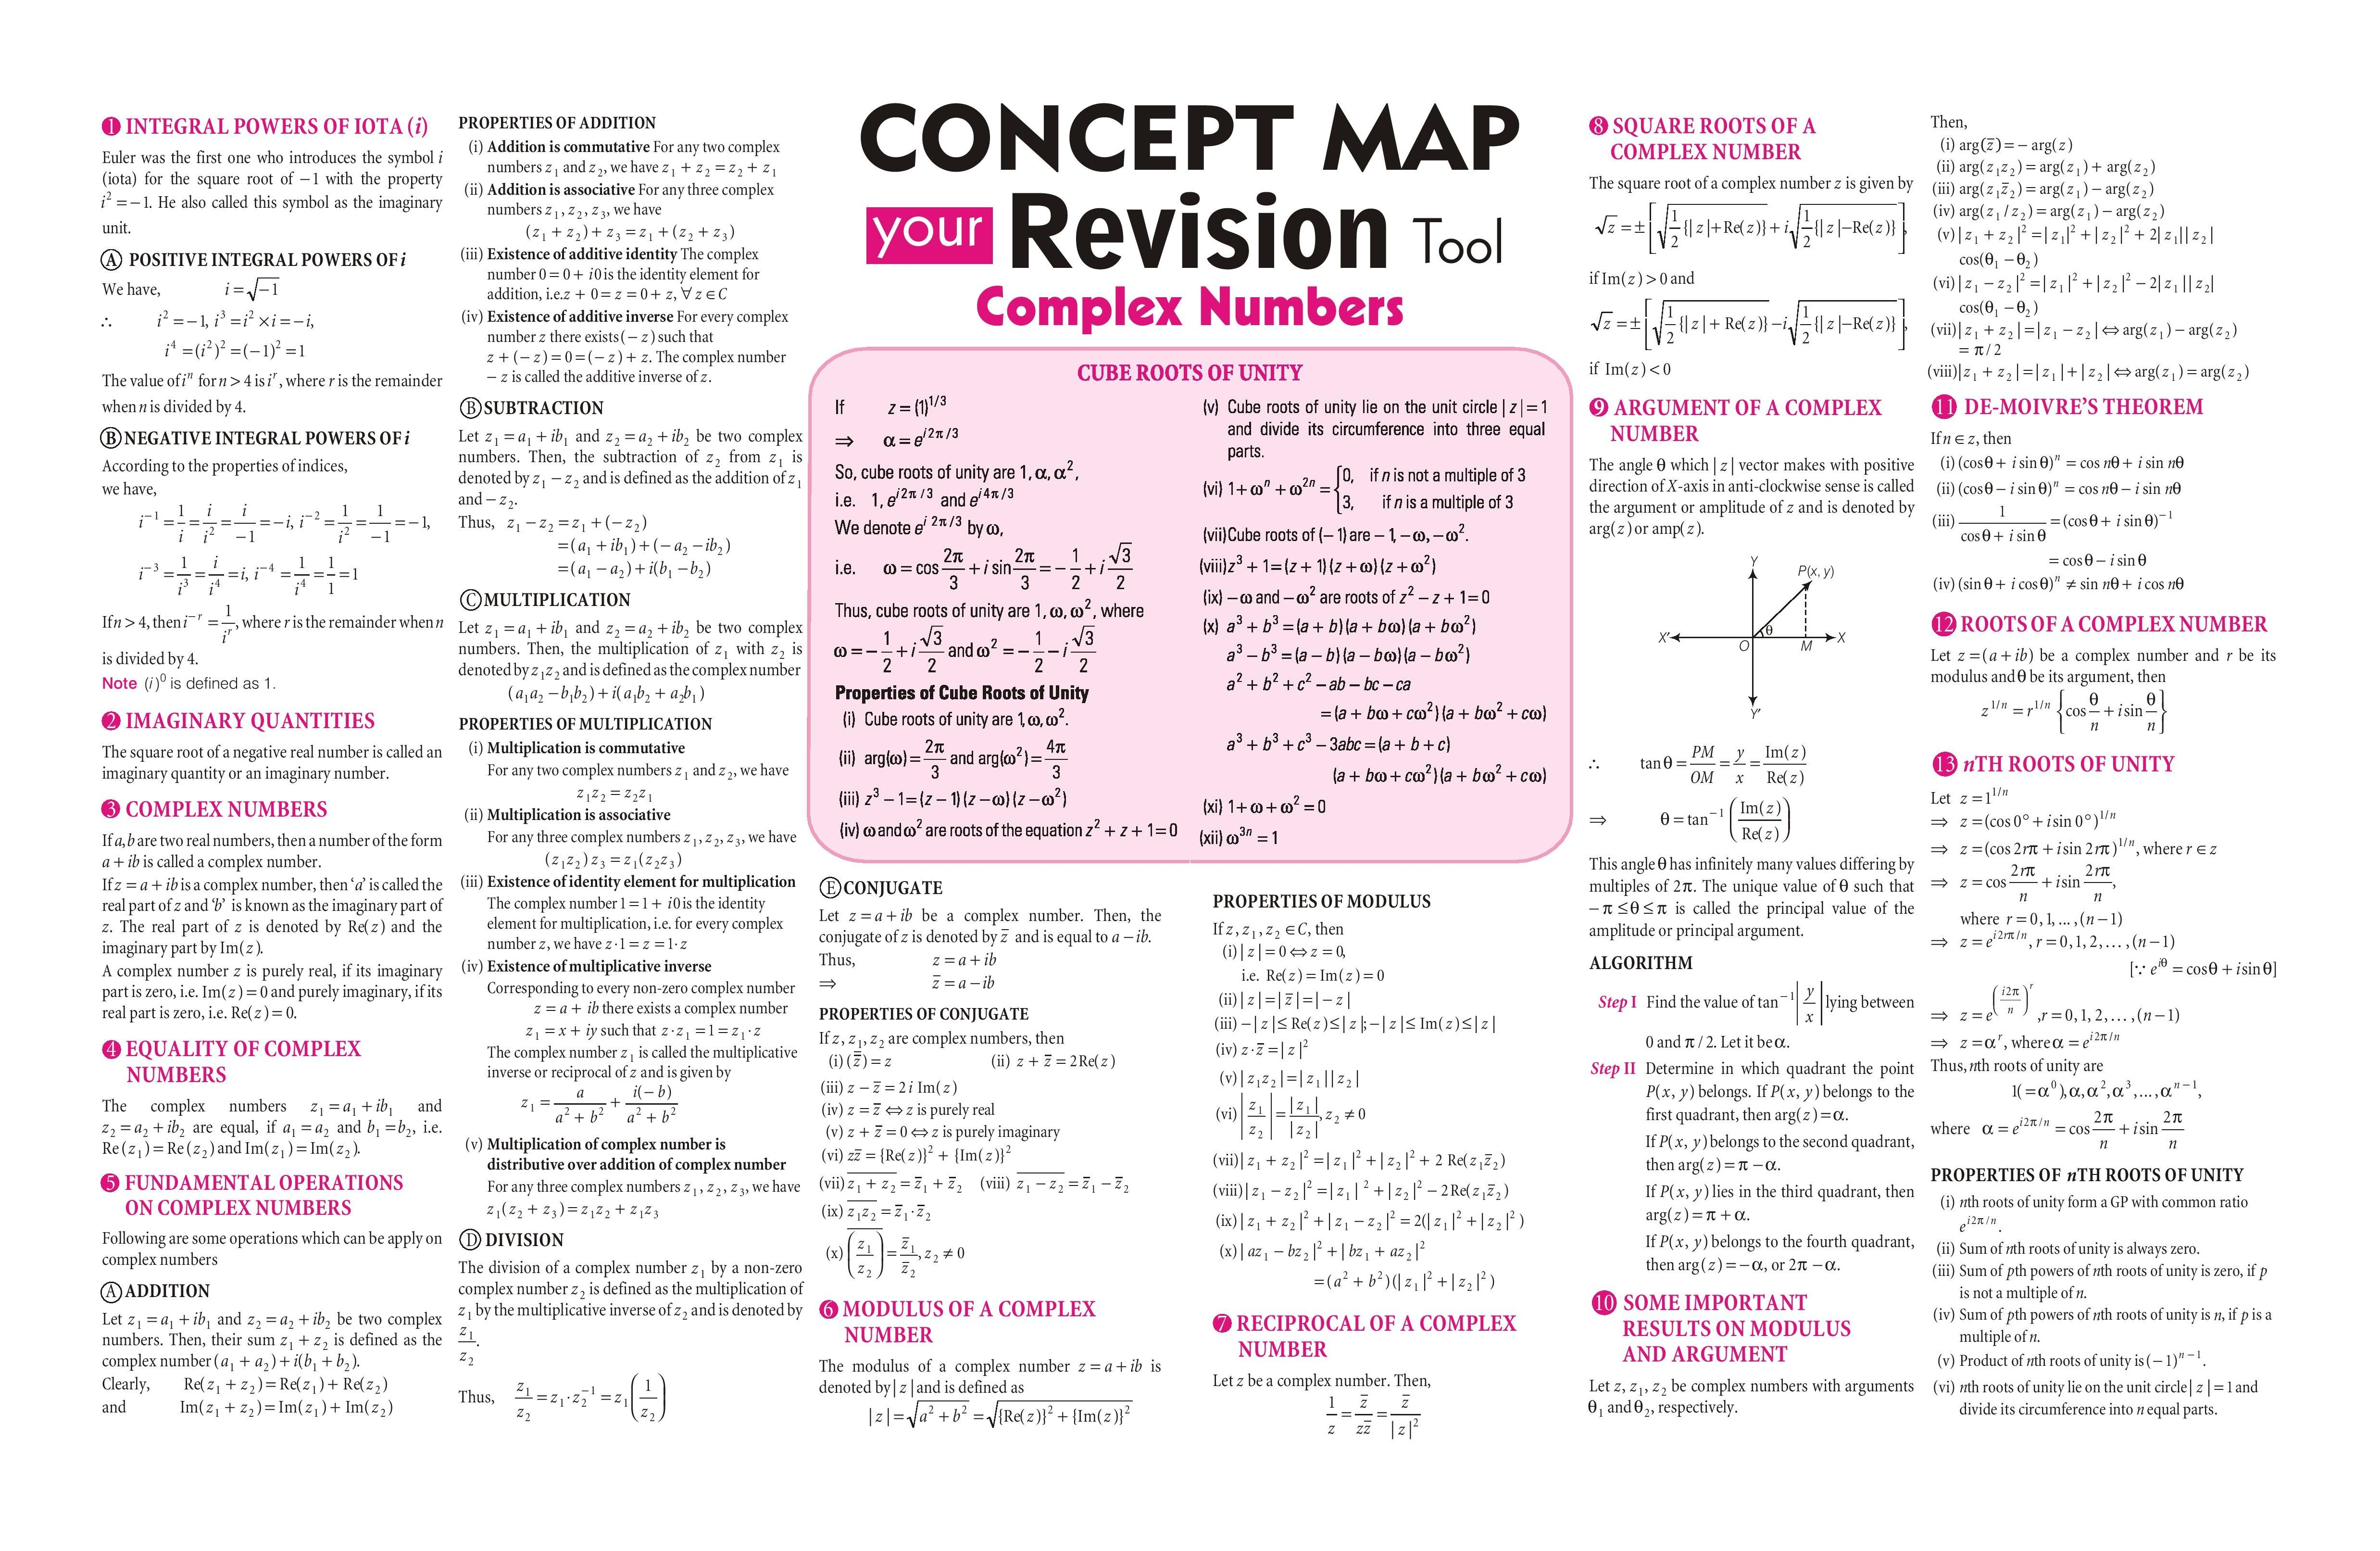 Complex Numbers Concept Map Your Revision Tool Arihant Mathematics Spectrum Mathematics Worksheets Physics And Mathematics Mathematics Education [ 3225 x 4950 Pixel ]